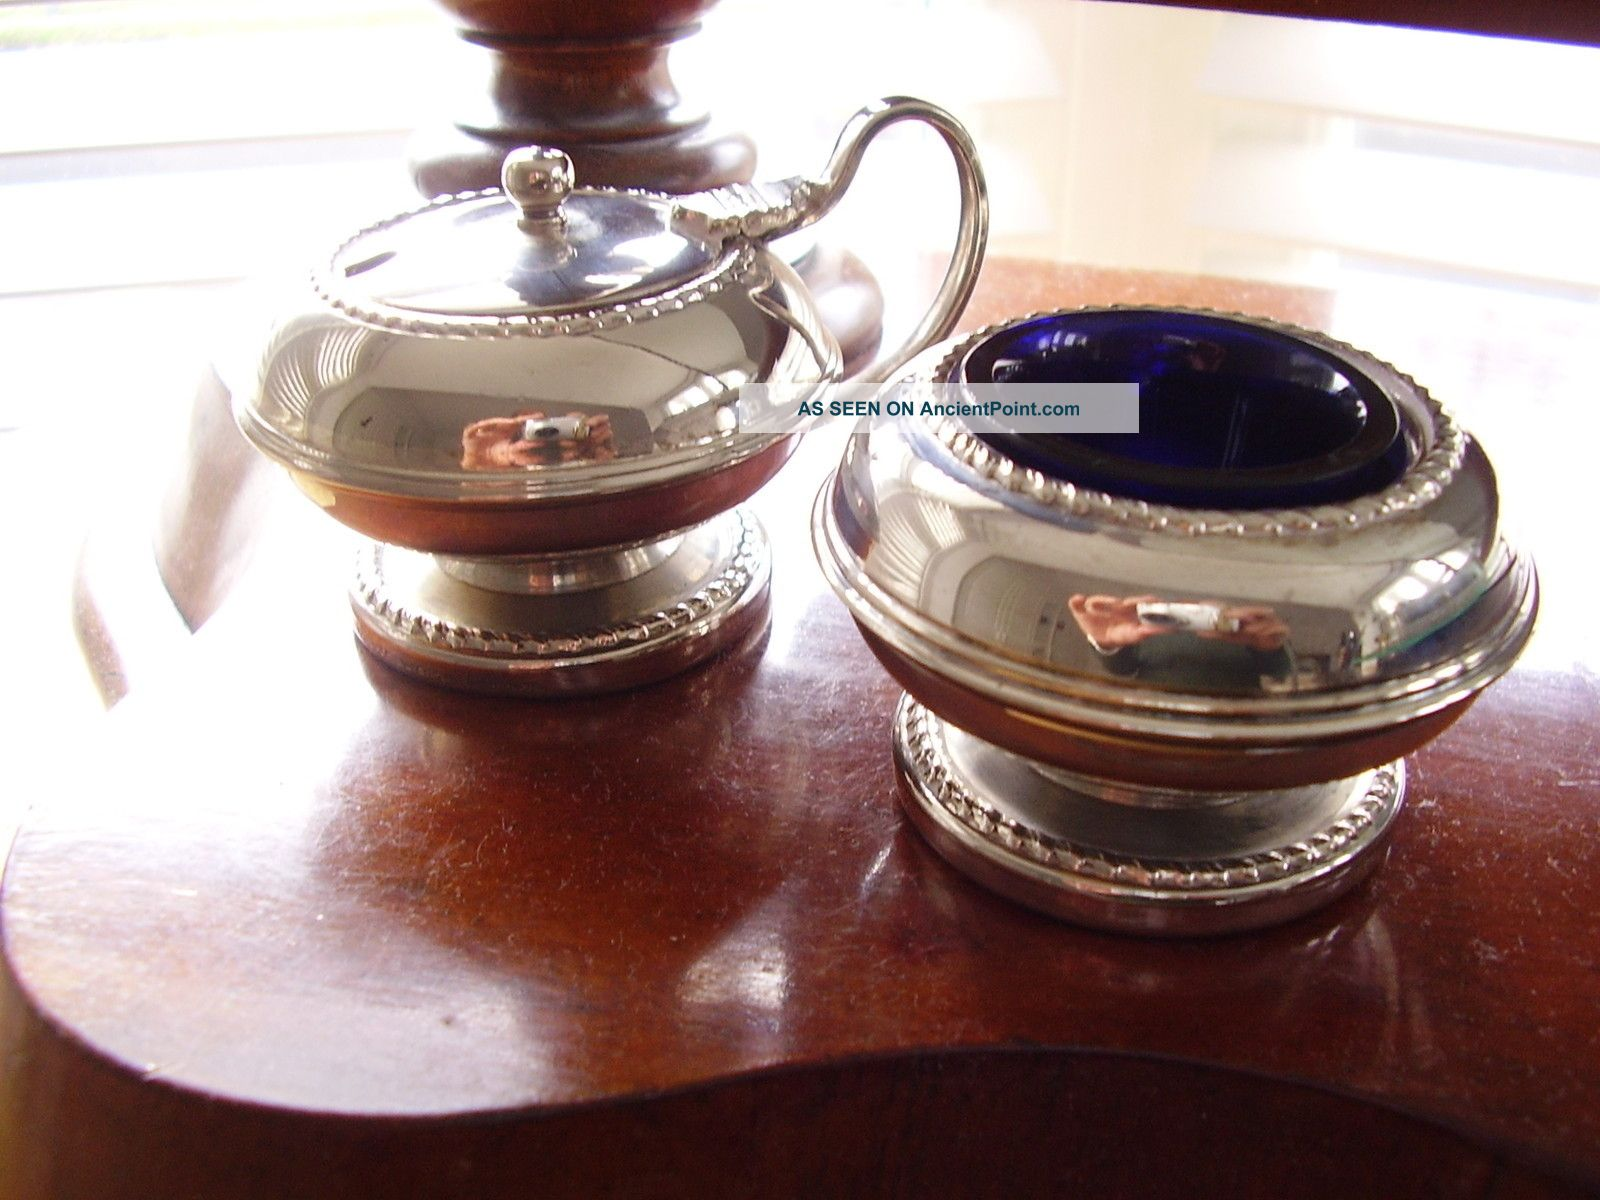 Vintage Set Of 1950 ' S Silver Plated Salt & Mustard Pot With Blue Glass Liner Salt & Pepper Cellars/ Shakers photo